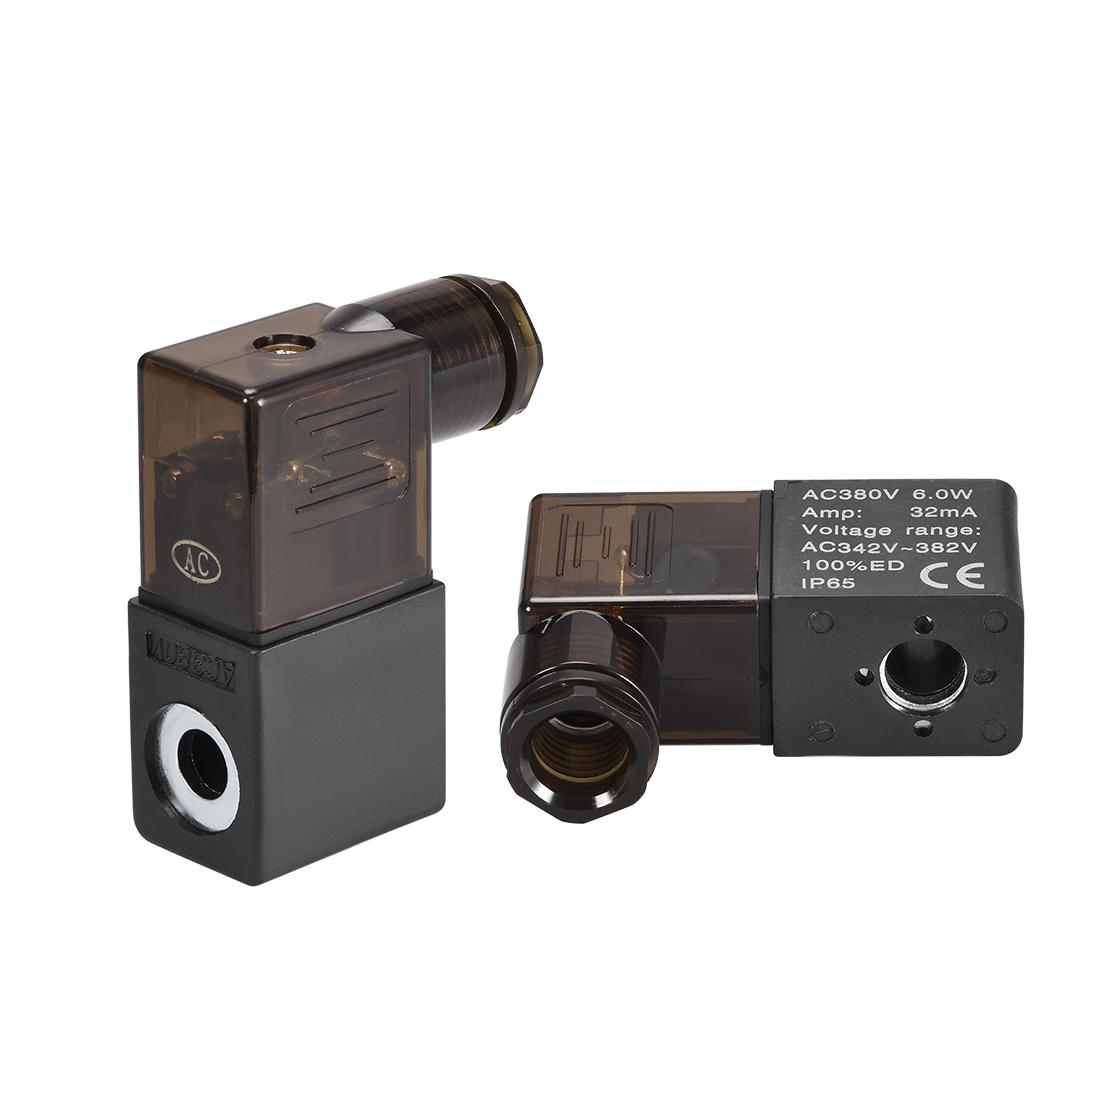 AC380V 6W Electric Solenoid Air Valve Coil w Red Light,Black,2pcs